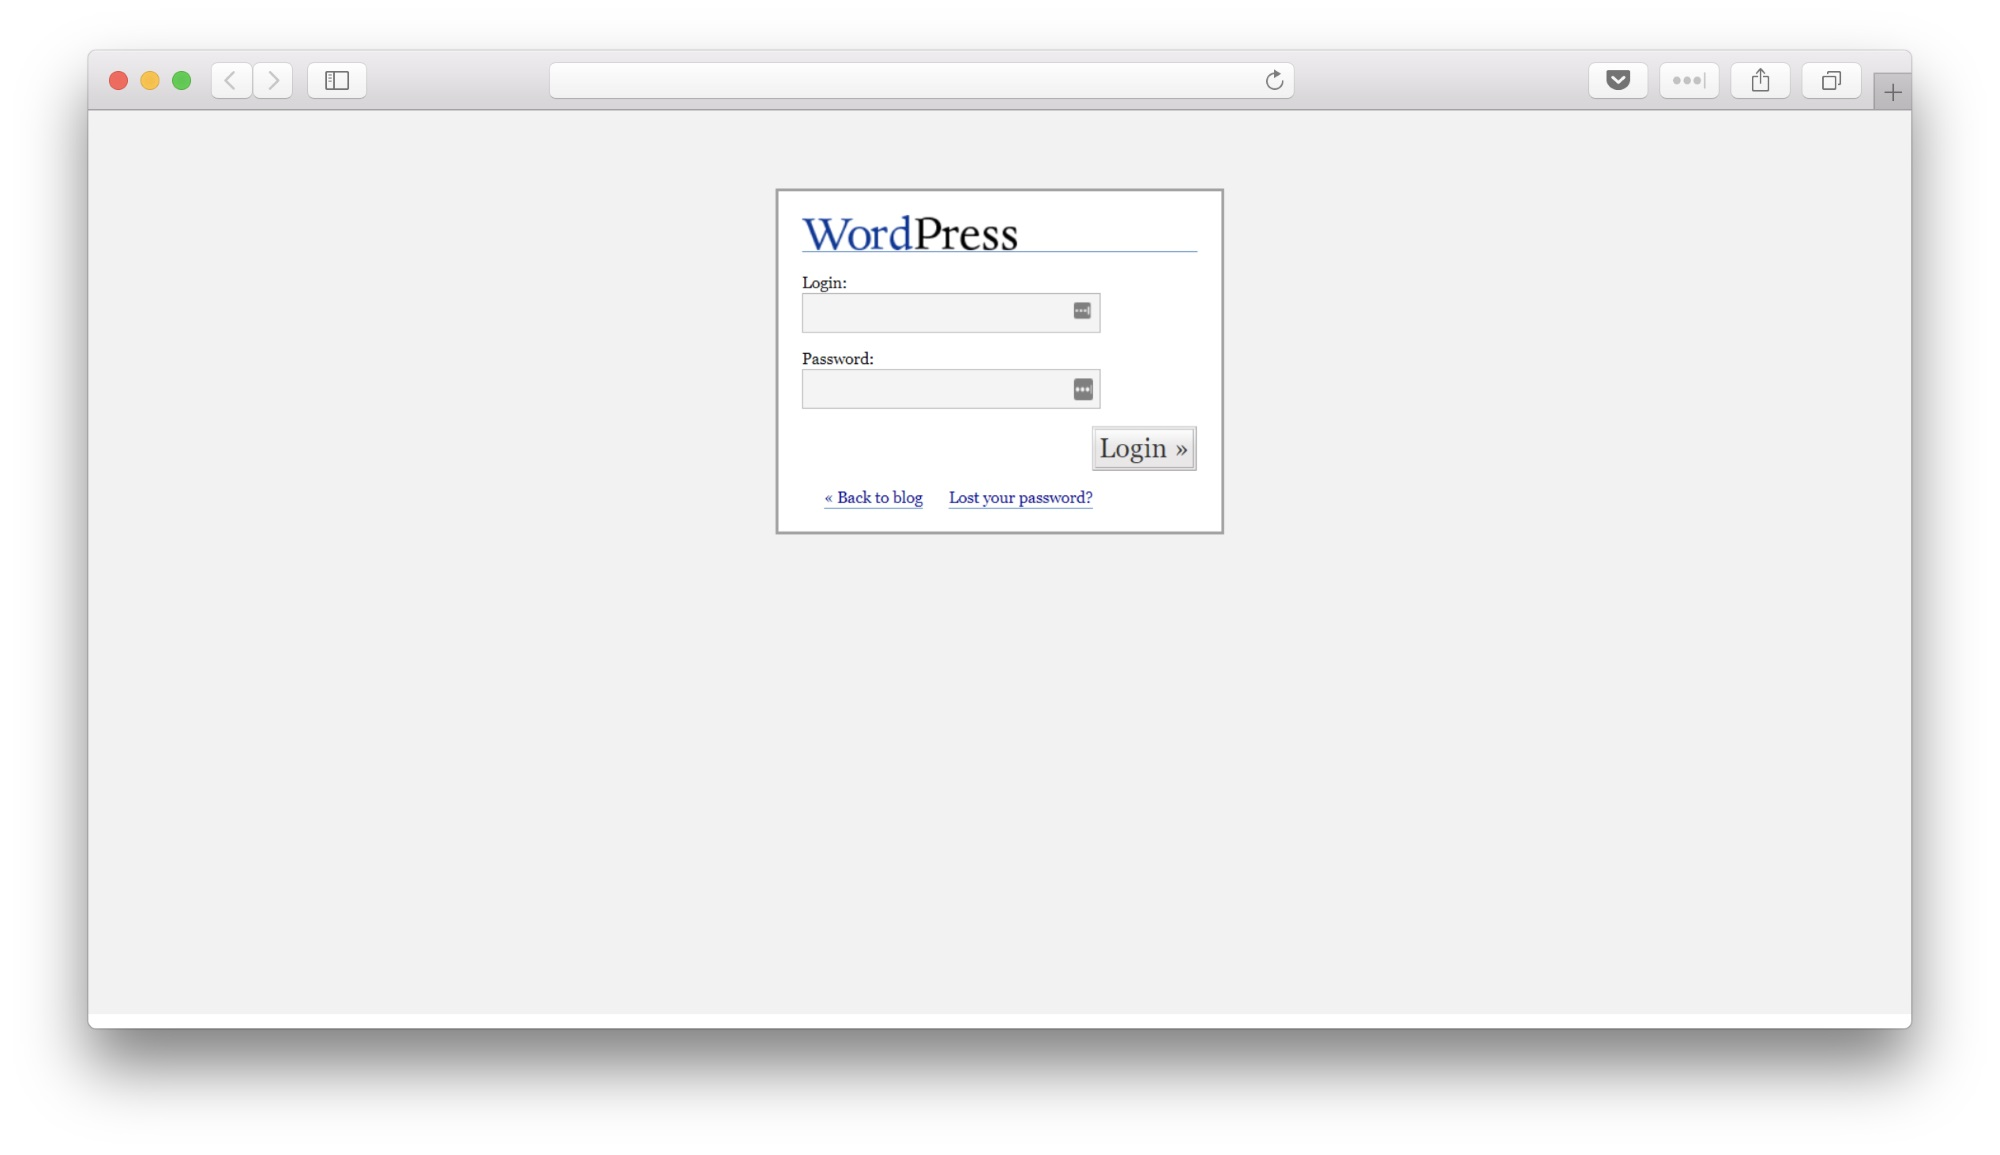 WordPress 1.5 login